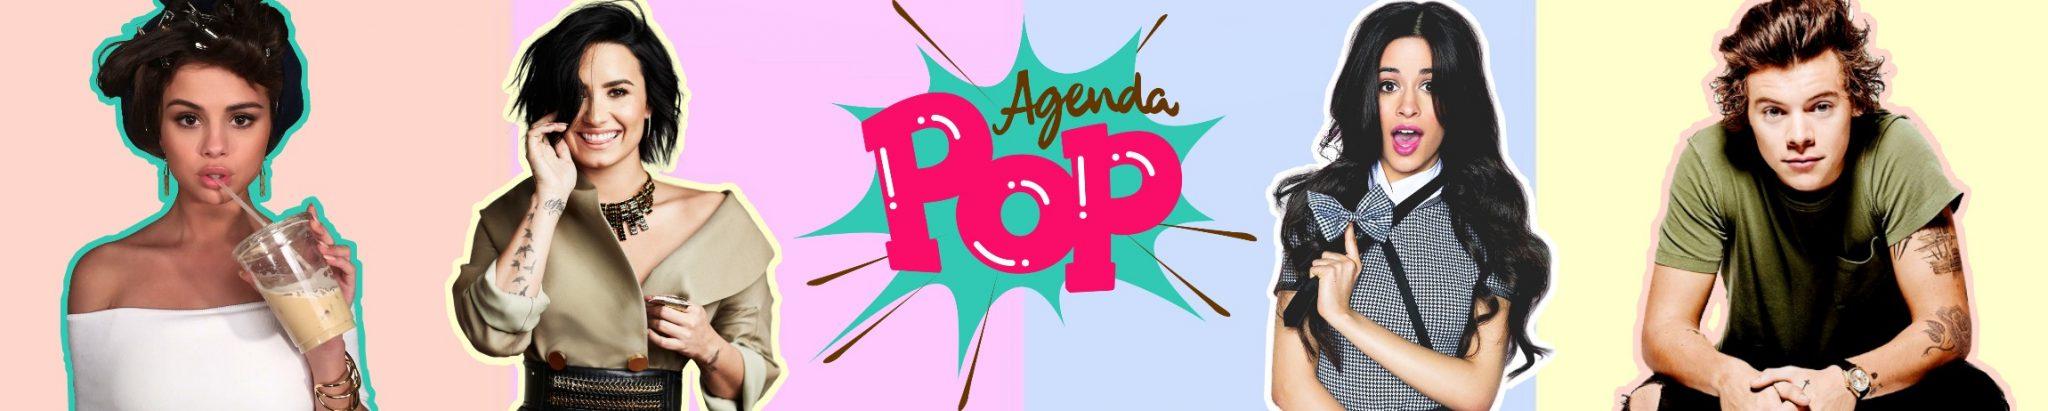 Agenda Pop